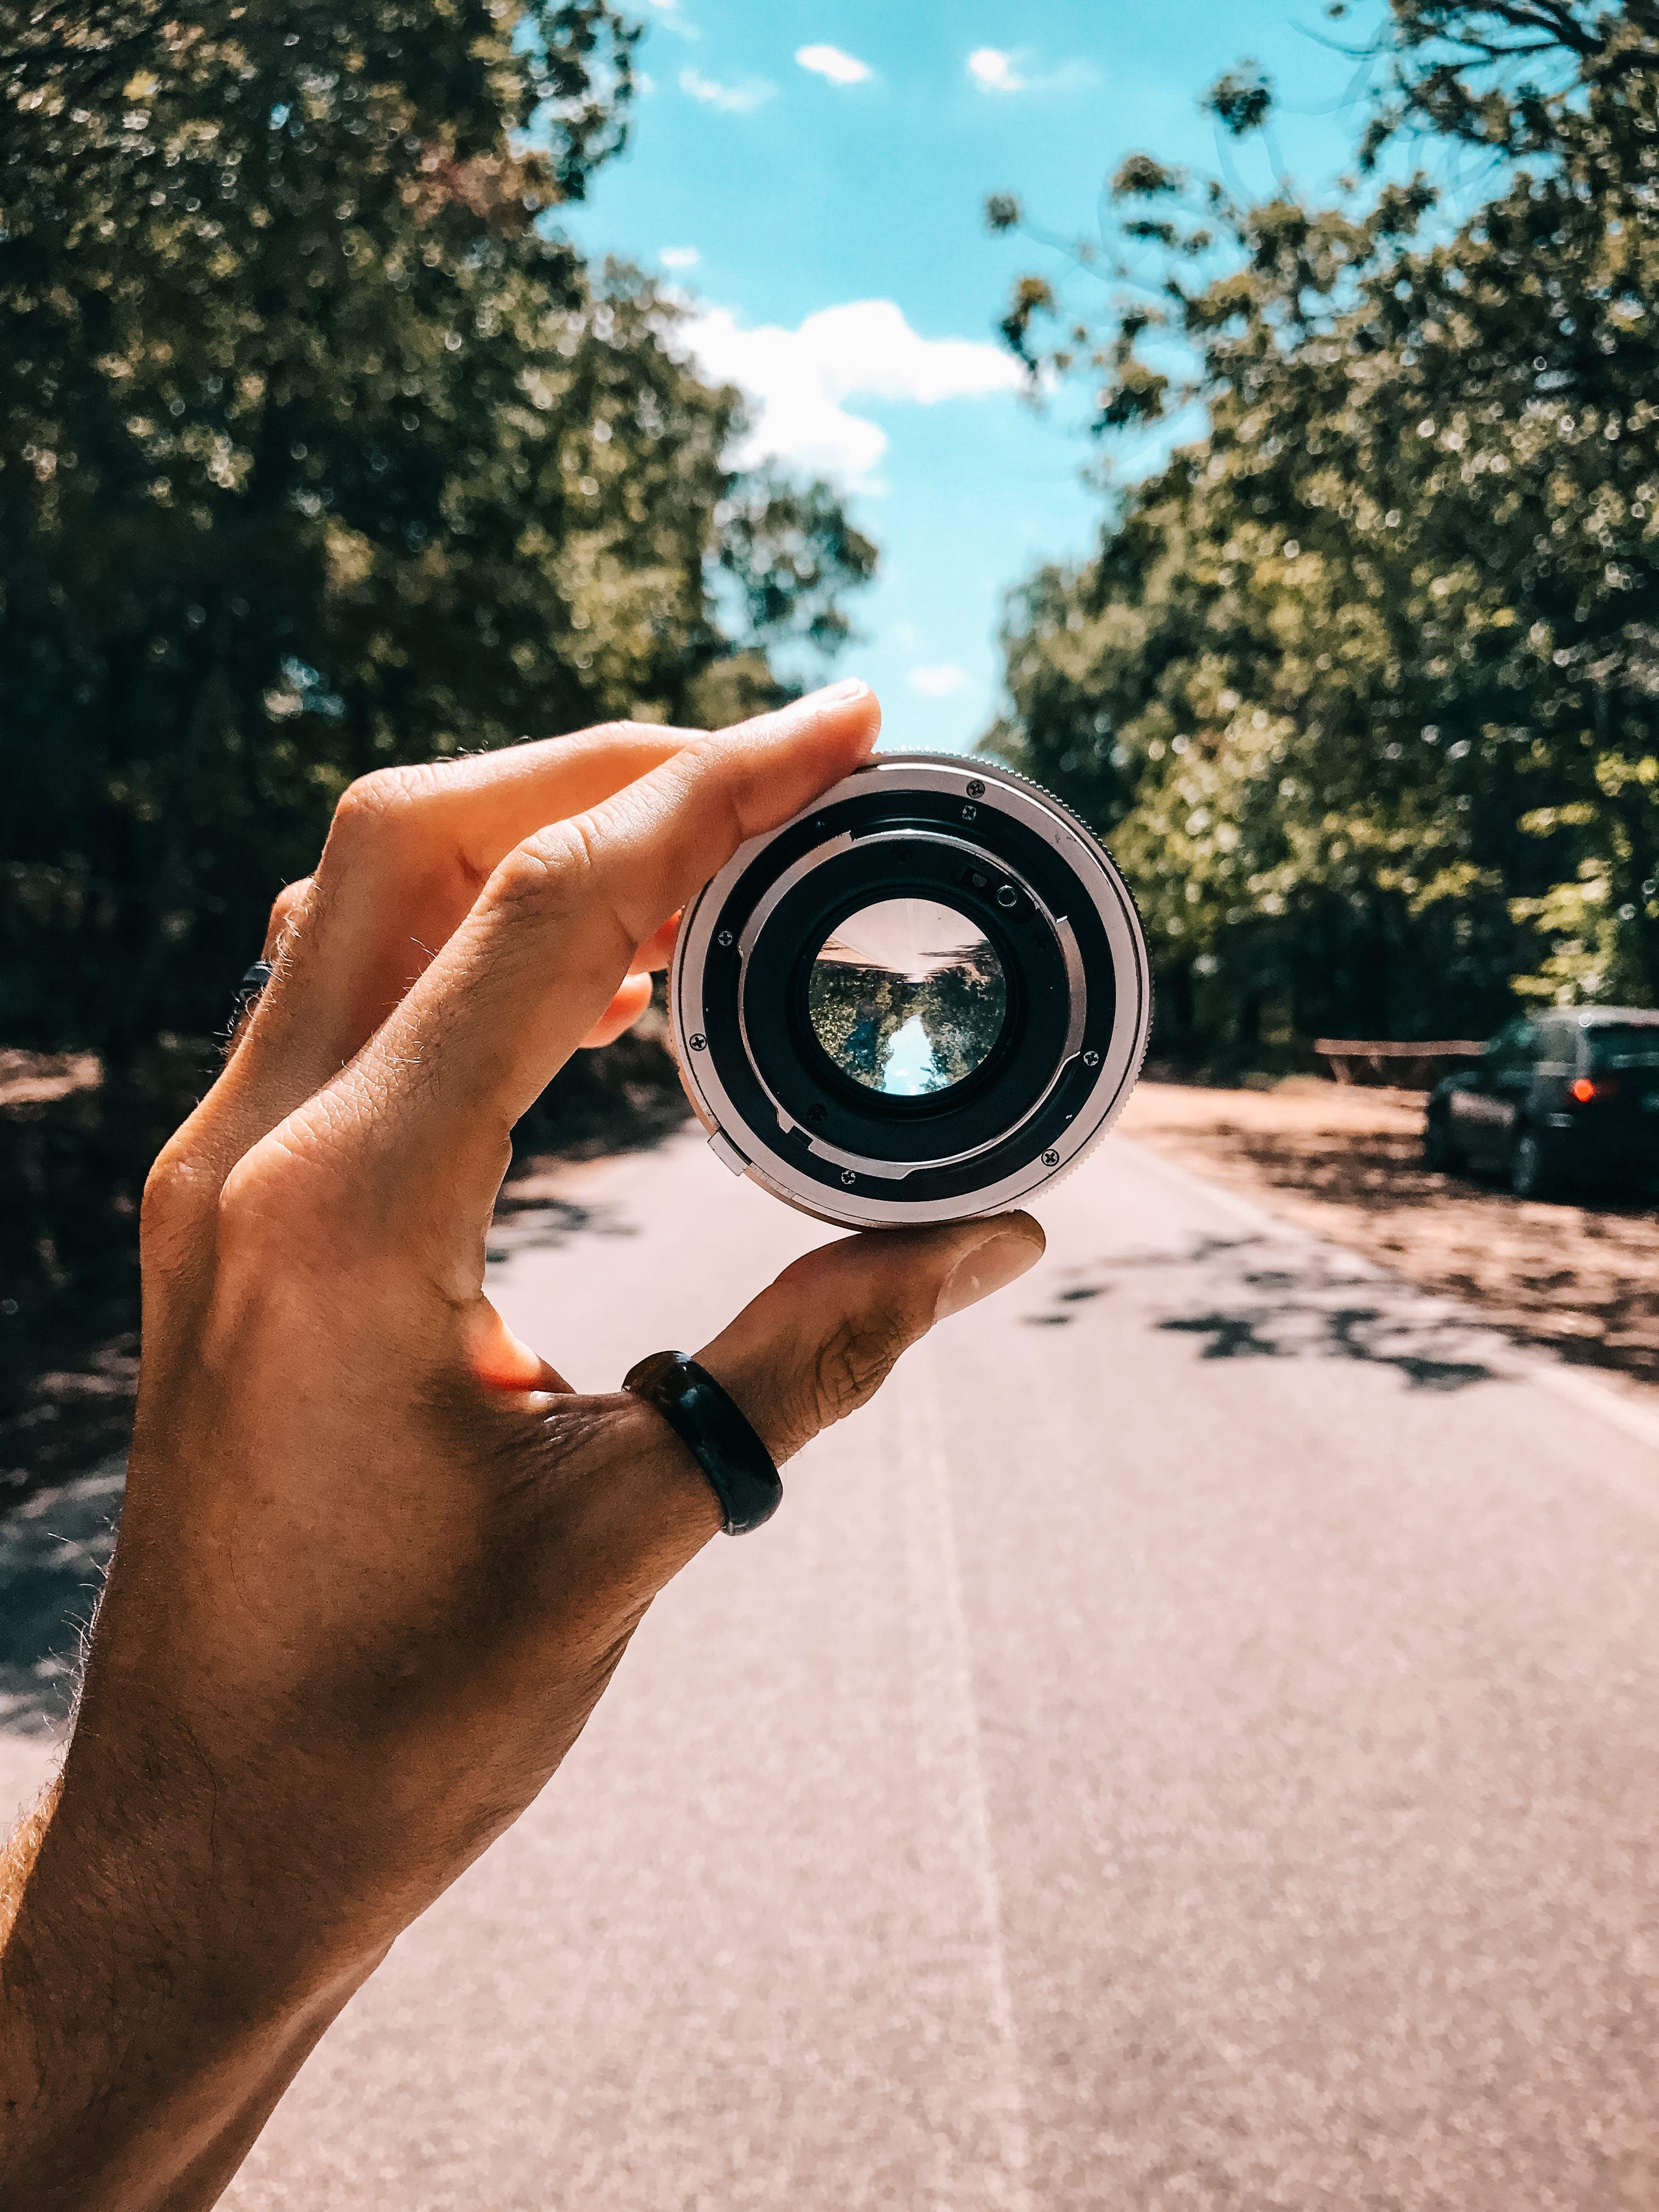 Gratis arkivbilde med asfalt, bil, dagtid, fokus